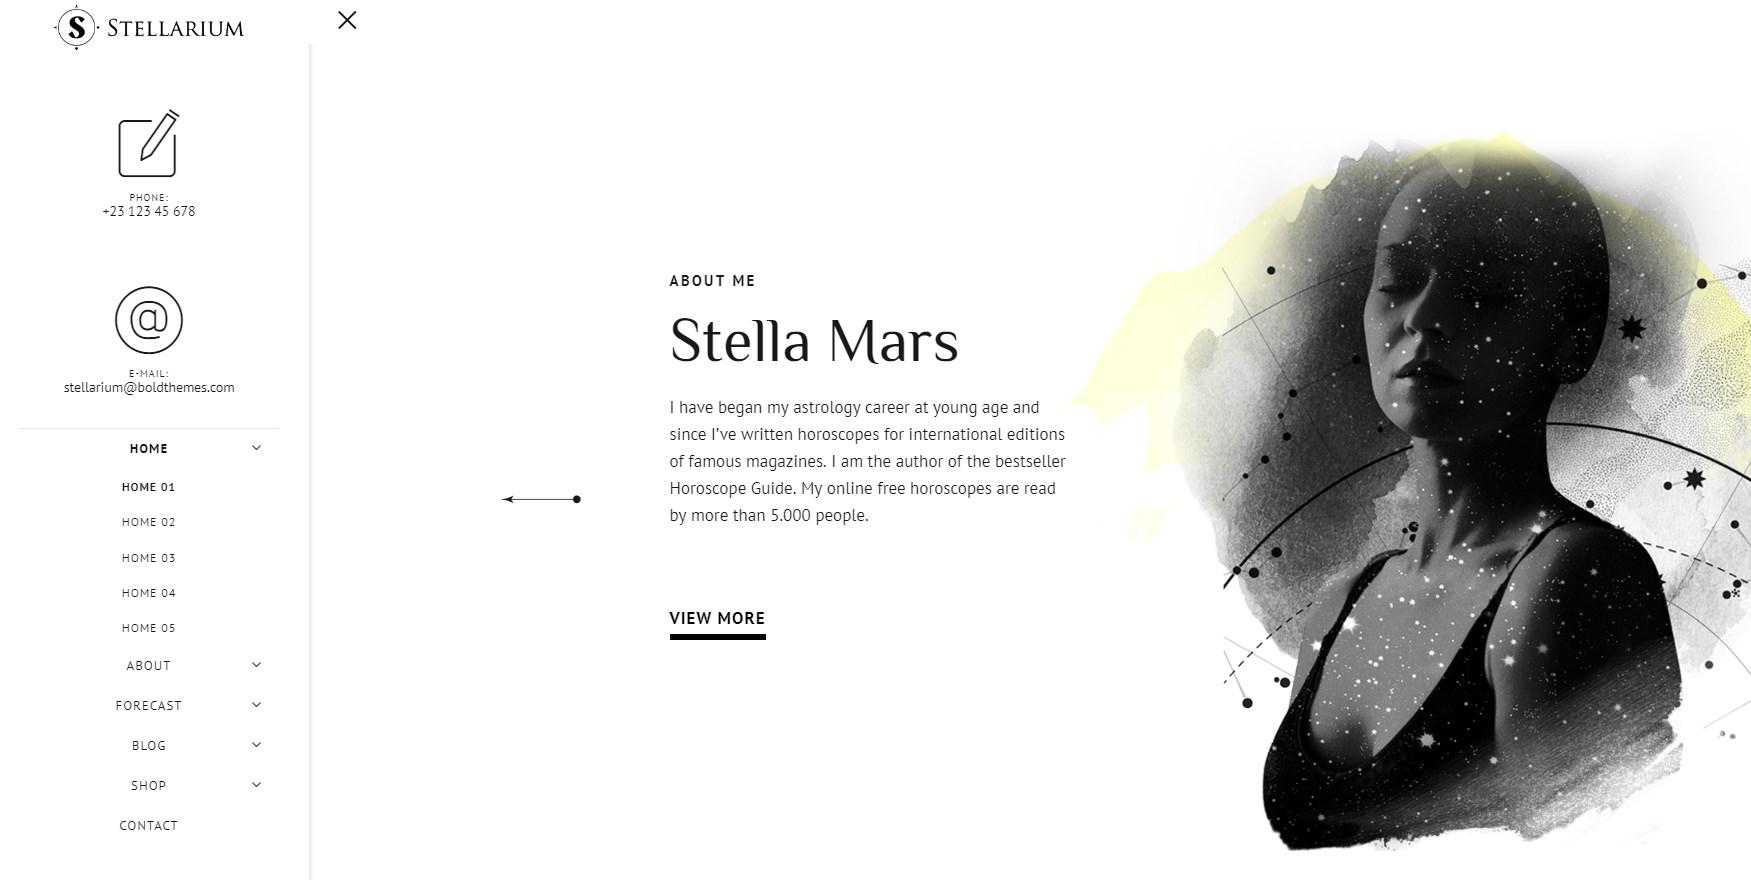 https://documentation.bold-themes.com/stellarium/wp-content/uploads/sites/34/2018/06/stellarium-vertical-left.jpg